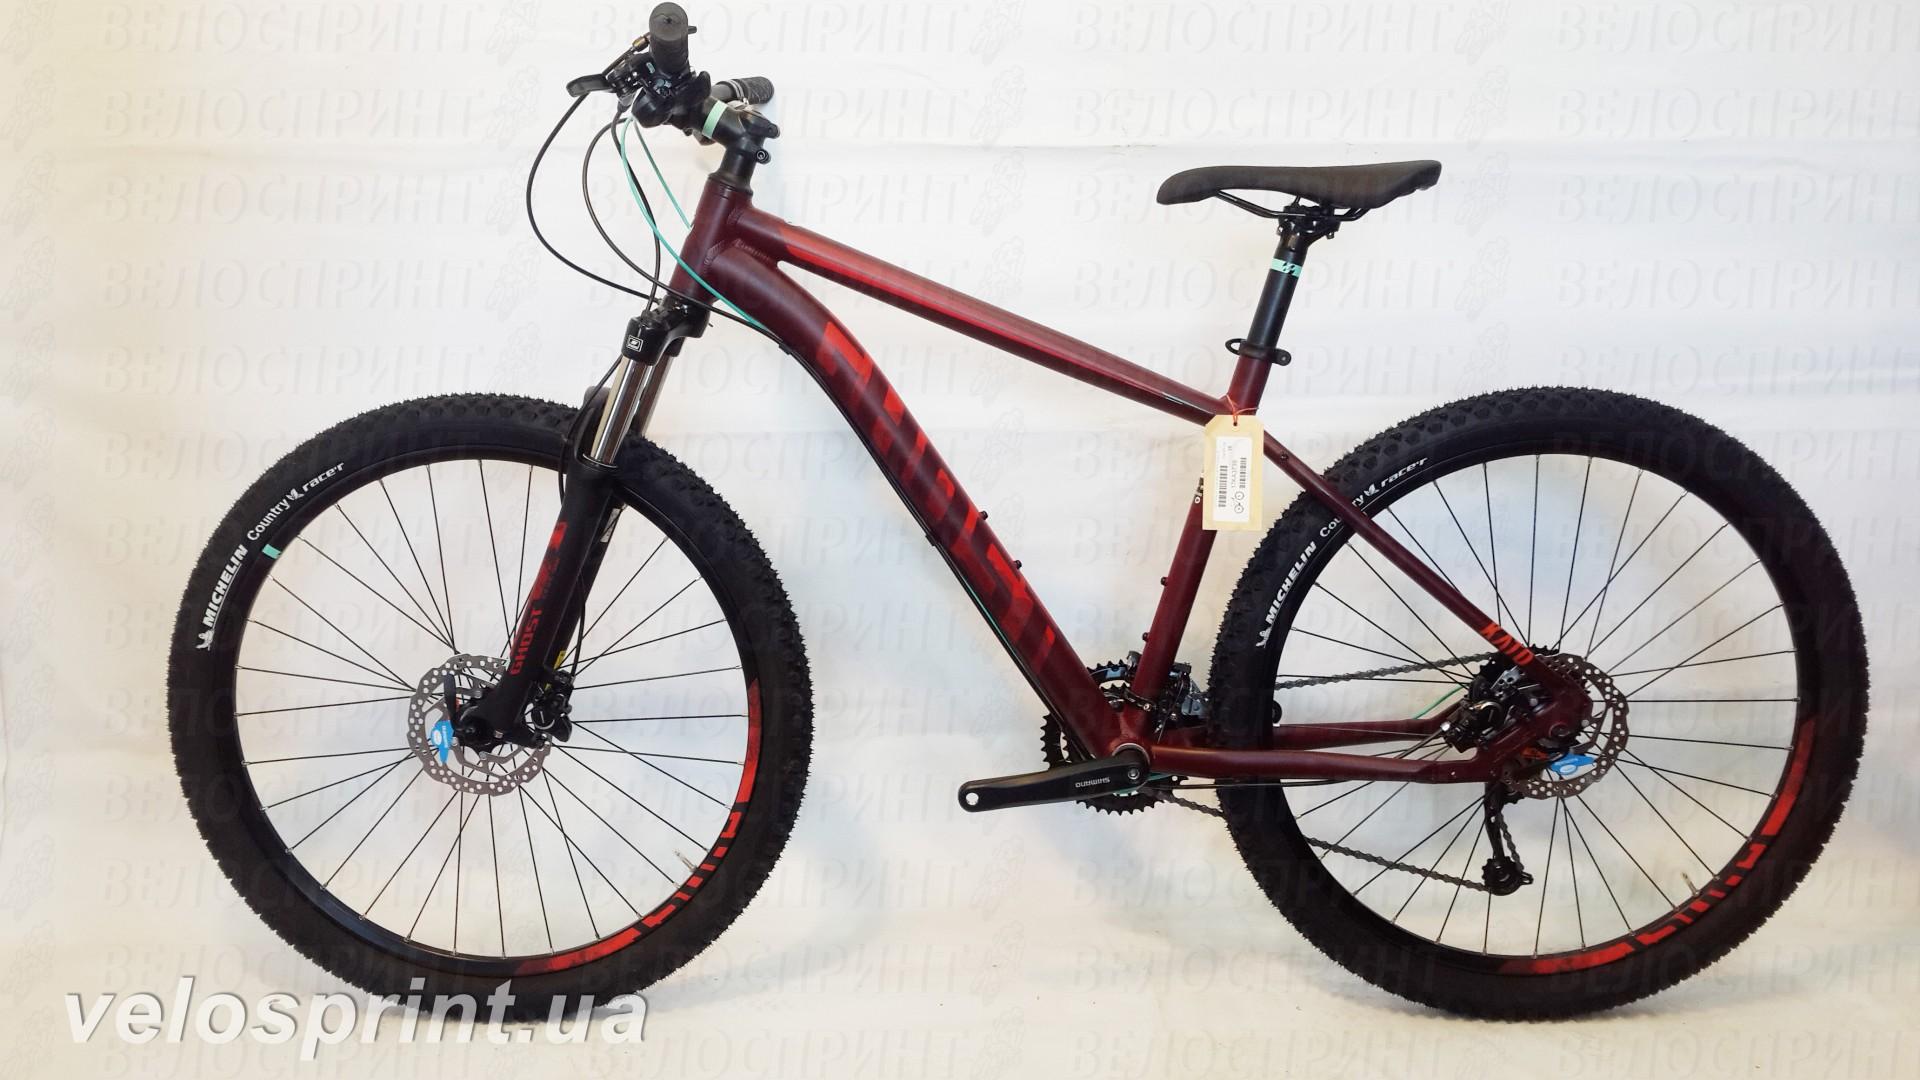 Велосипед GHOST Kato 3 AL 29 marsalared/cranberryred/jadeblue общий вид год 2017